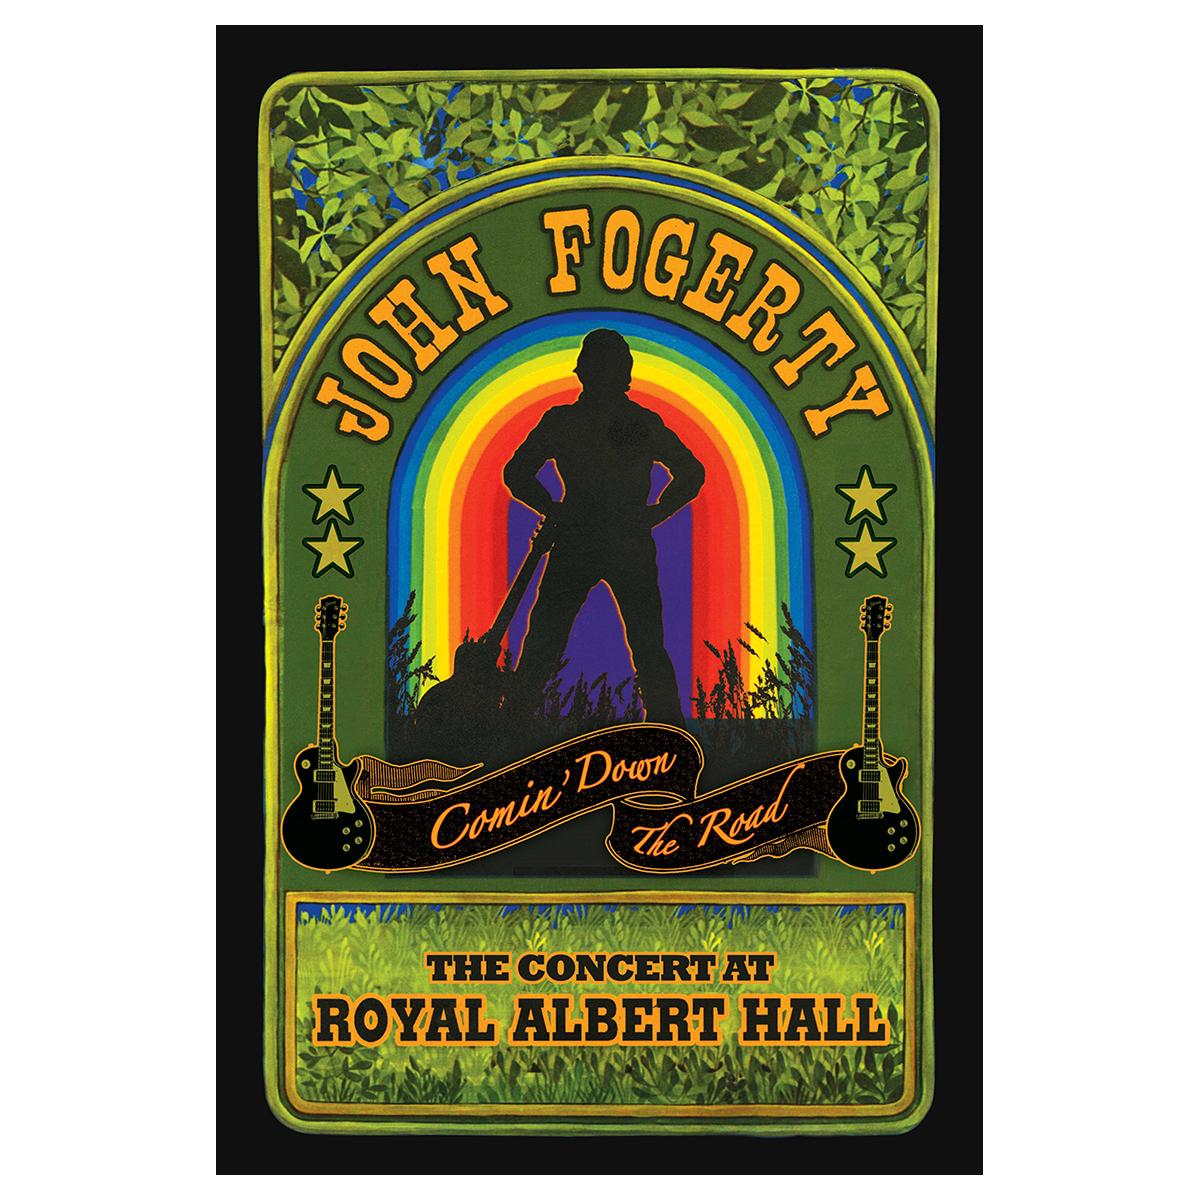 John Fogerty - Comin' Down The Road: The Concert At Royal Albert Hall DVD